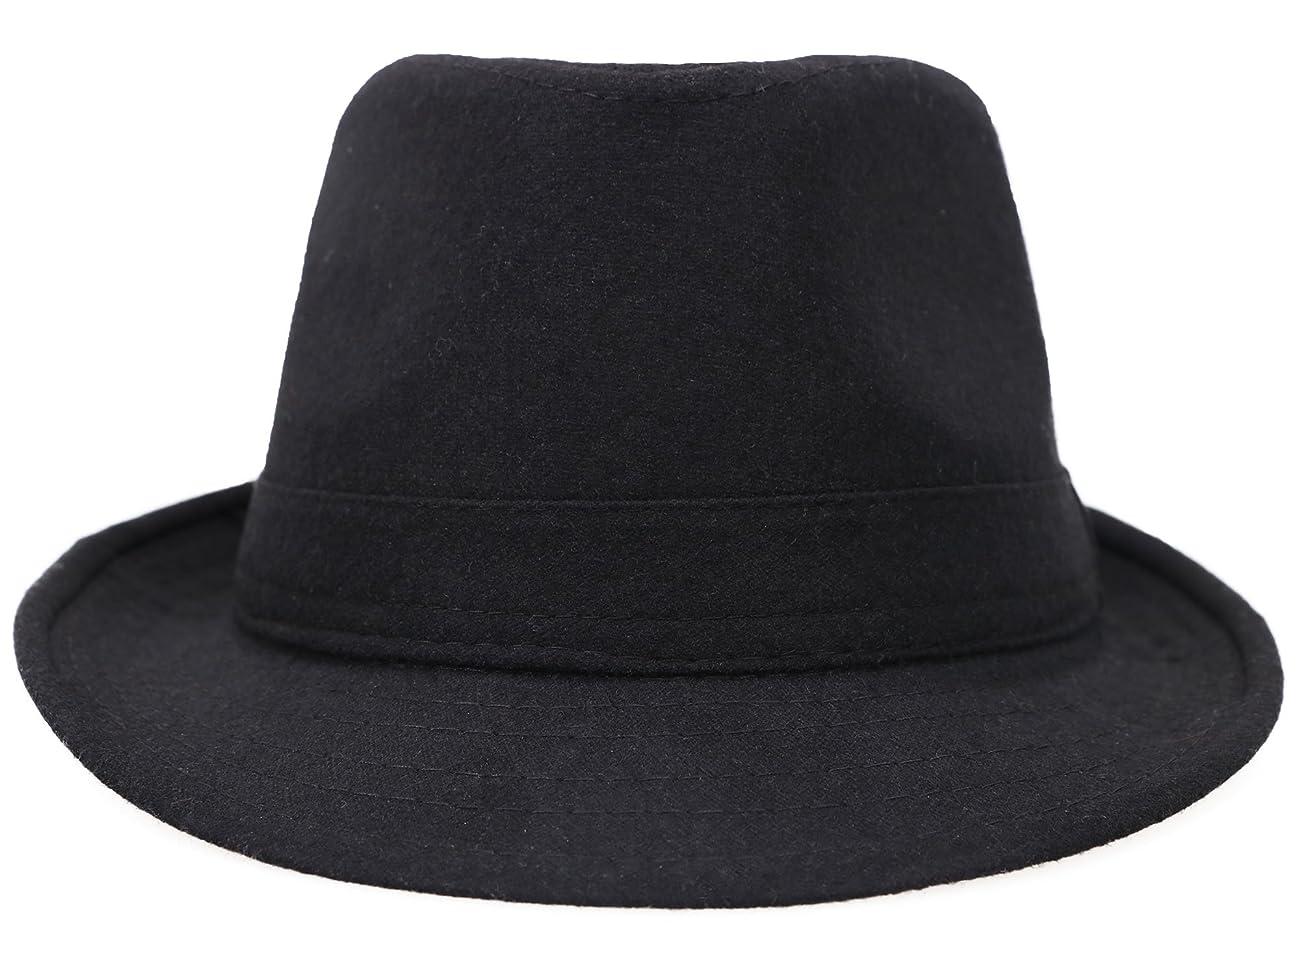 Simplicity Women Men's Fashion Fall / Winter Dapper Fedora Hat w/ Wide Brim 1